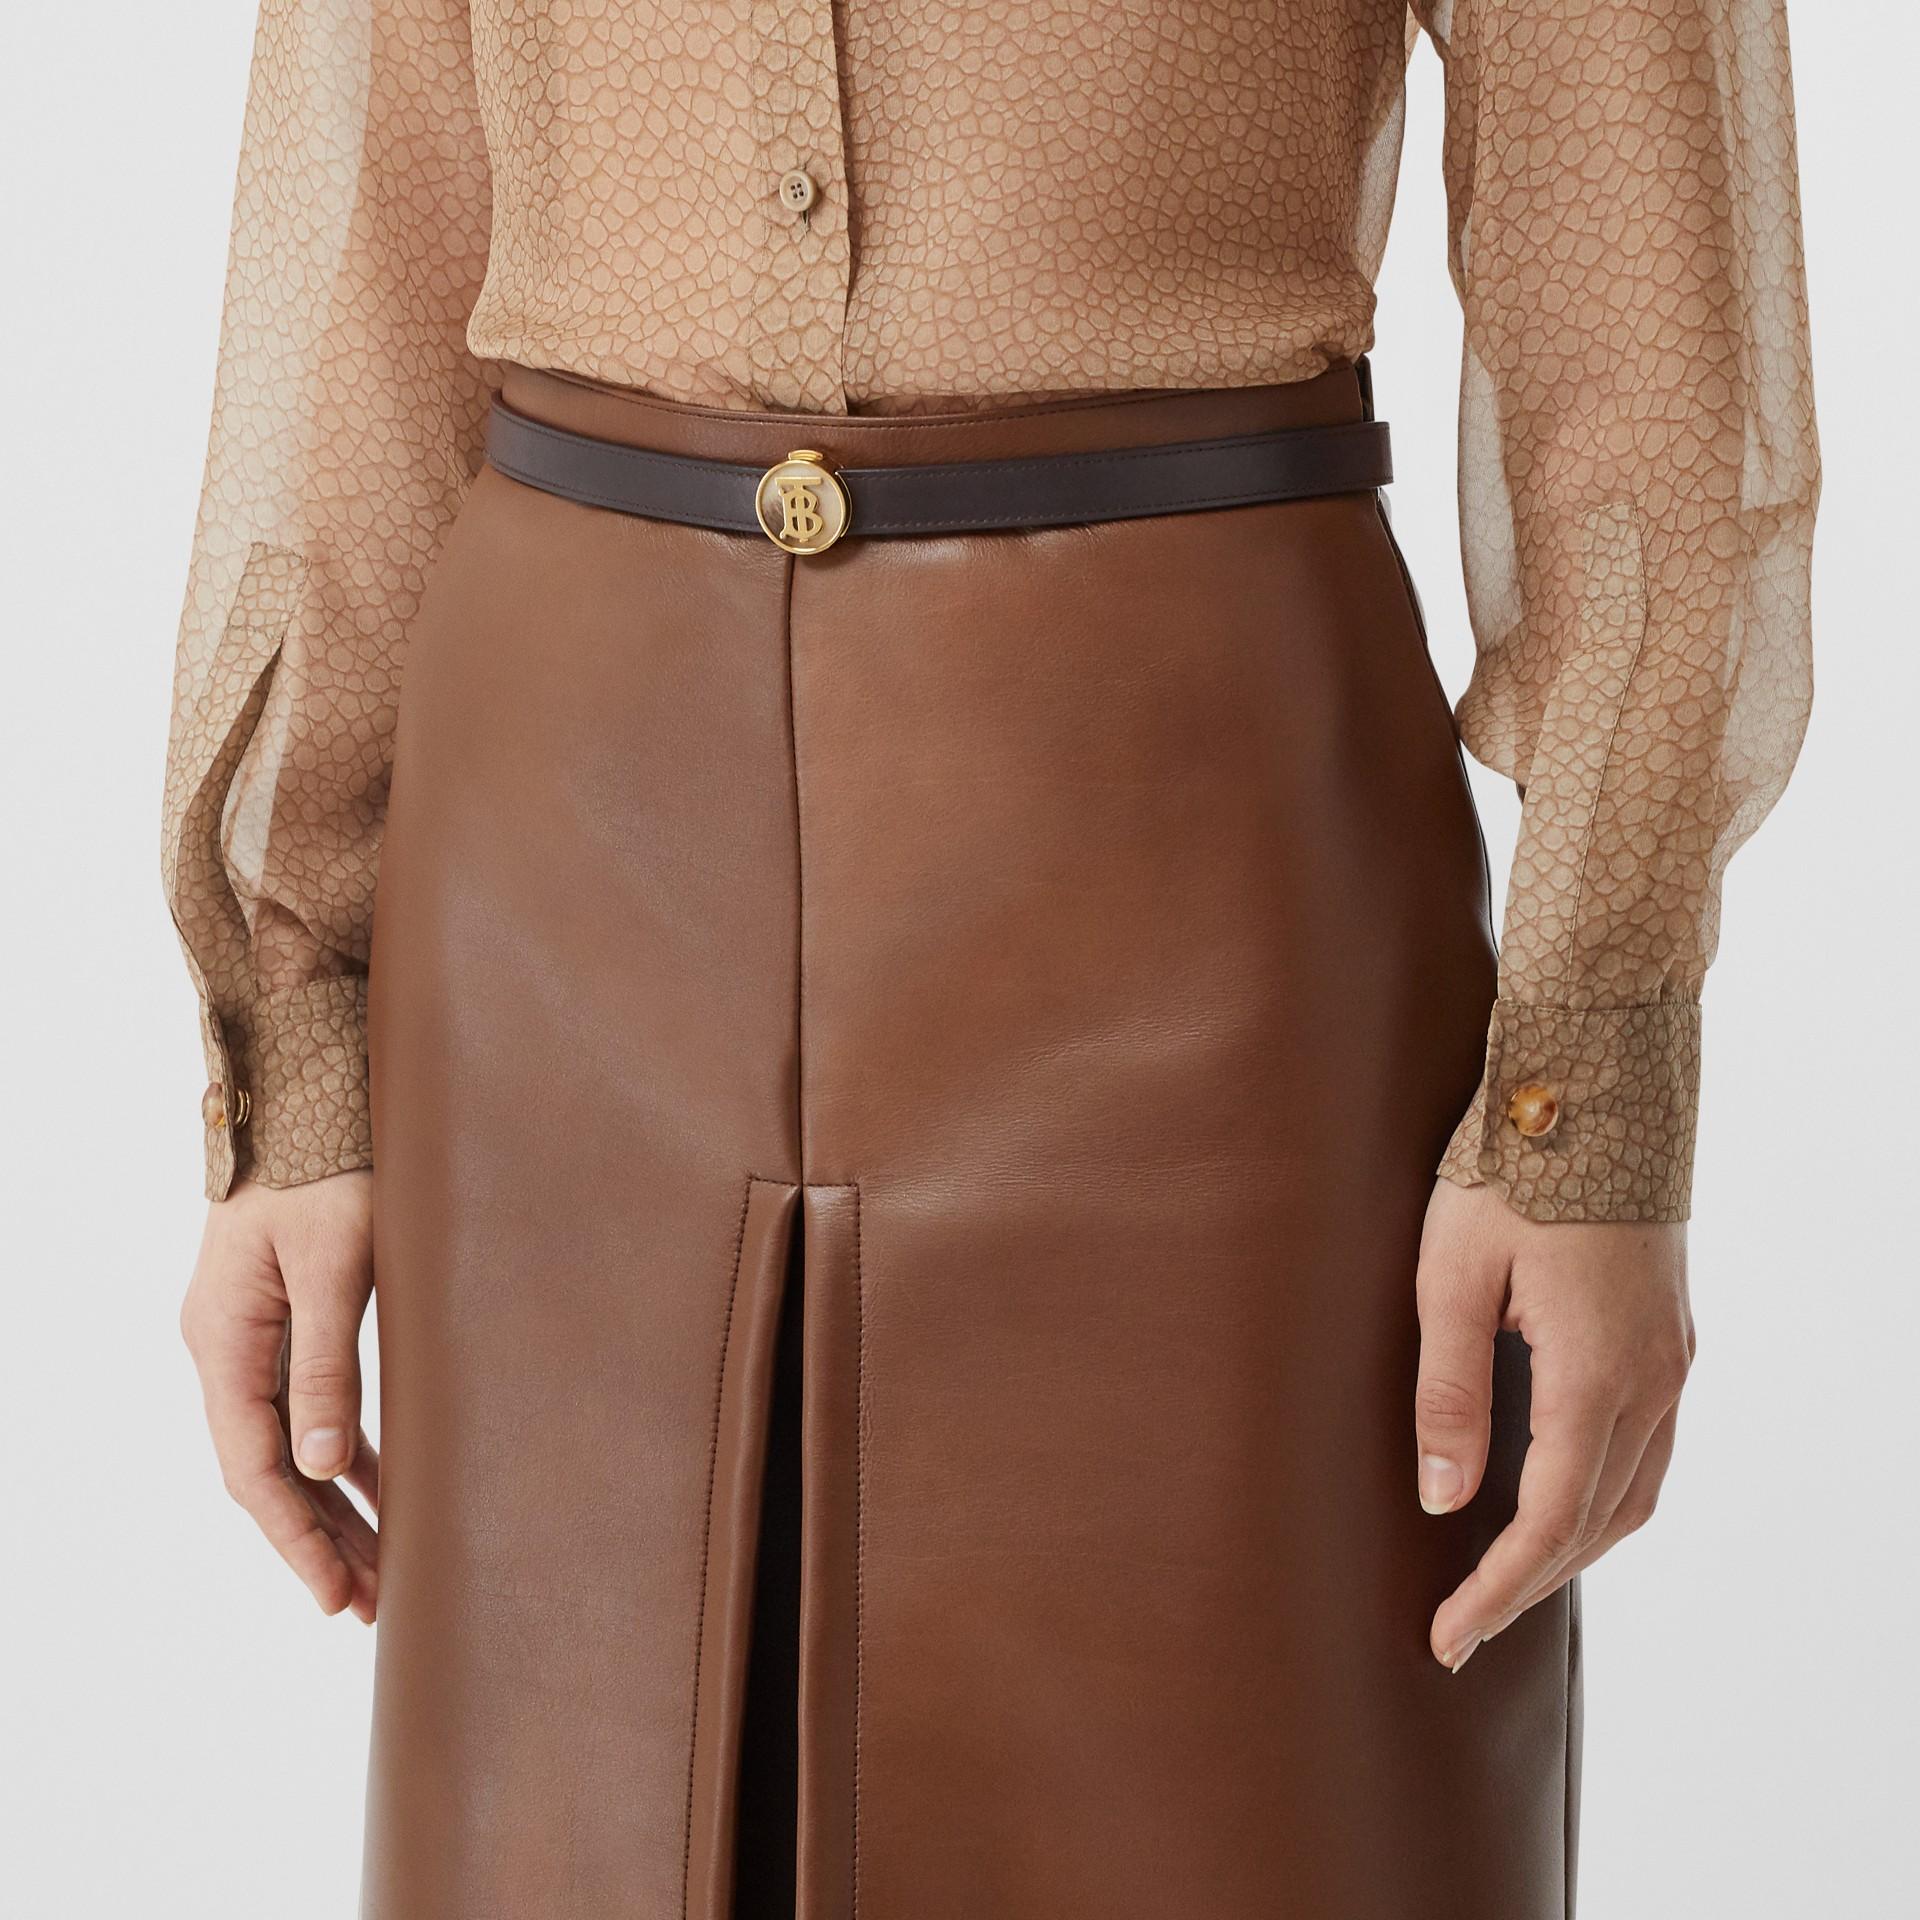 Monogram Motif Leather Belt in Deep Brown - Women | Burberry United Kingdom - gallery image 2